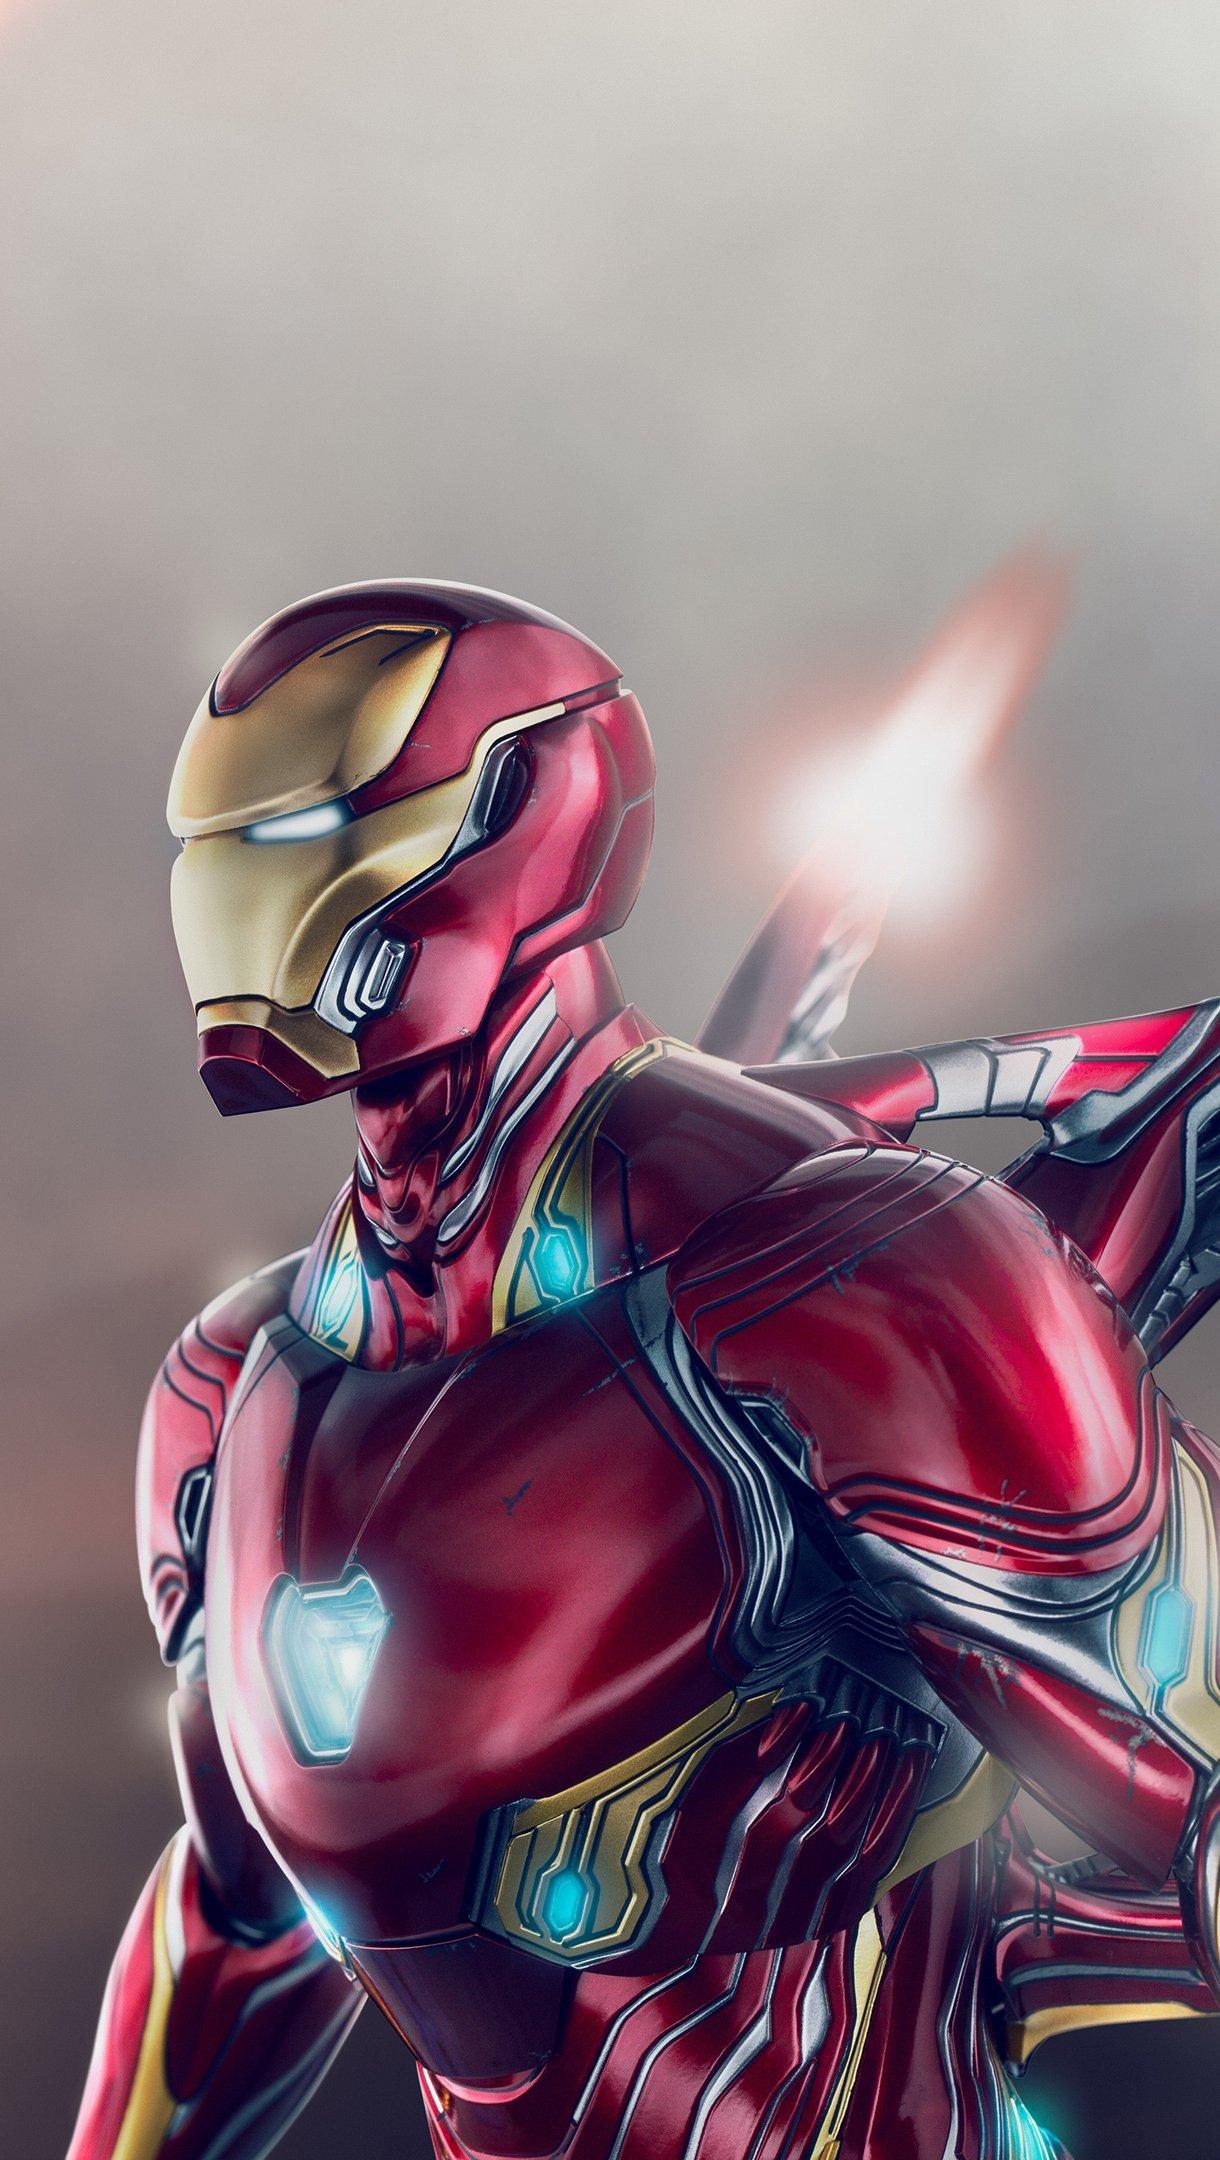 Wallpaper Iron Man wing suit Vertical